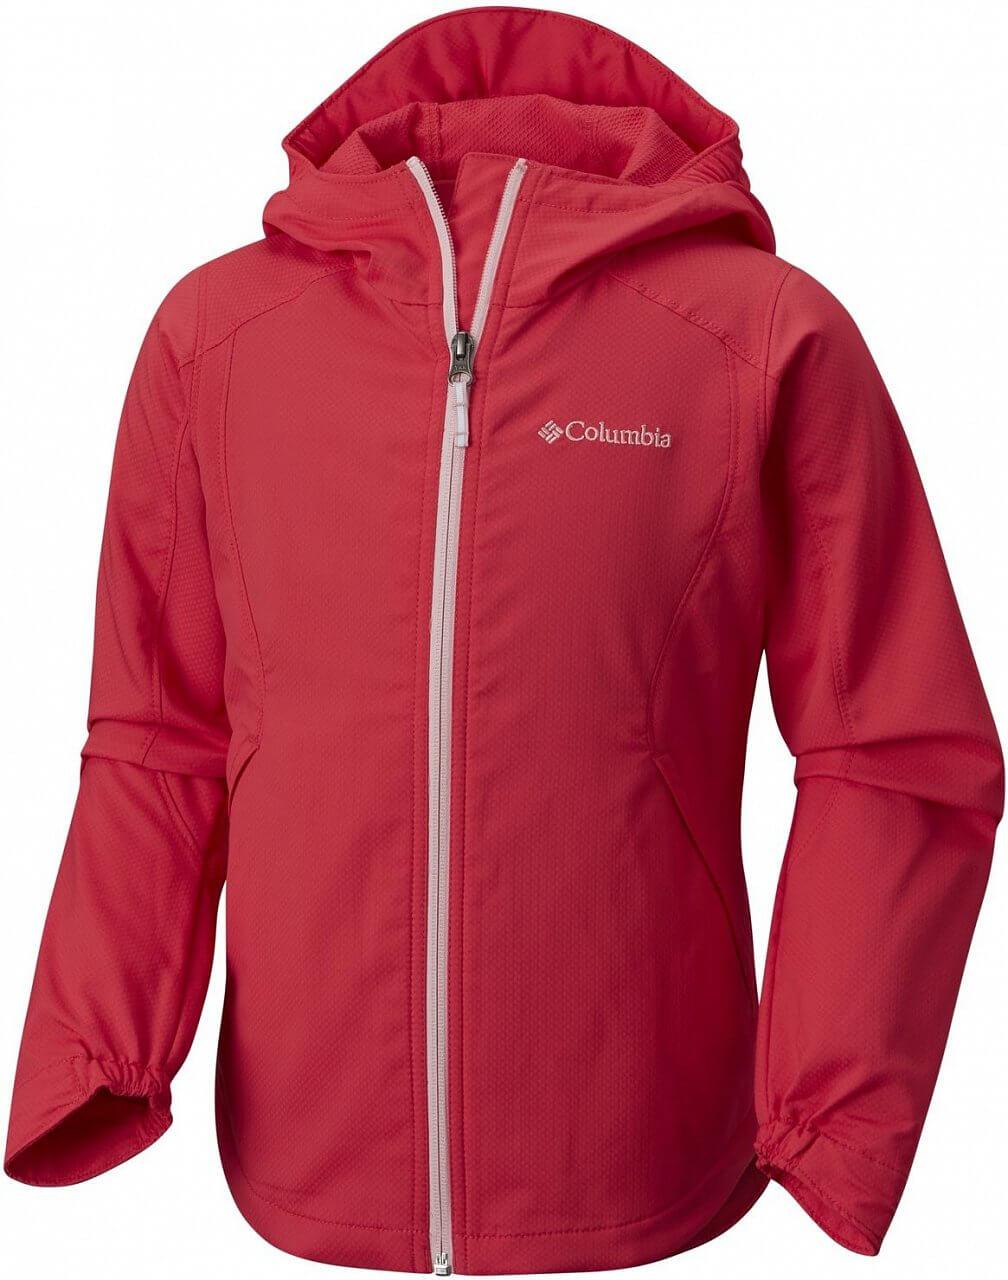 Dětská bunda Columbia Splash Flash II Hooded Softshell Jacket